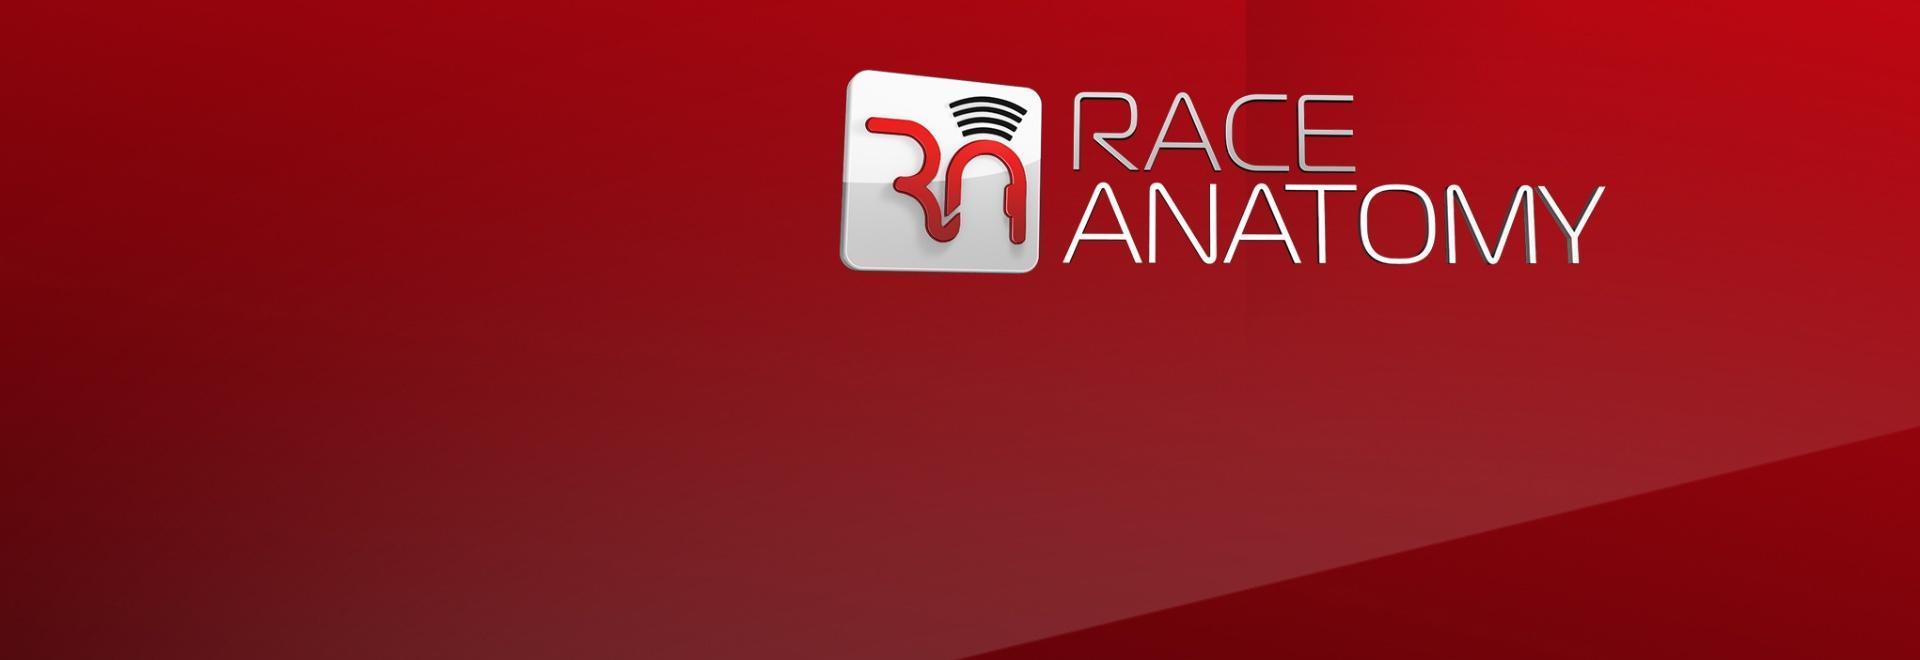 Race Anatomy F1 2018